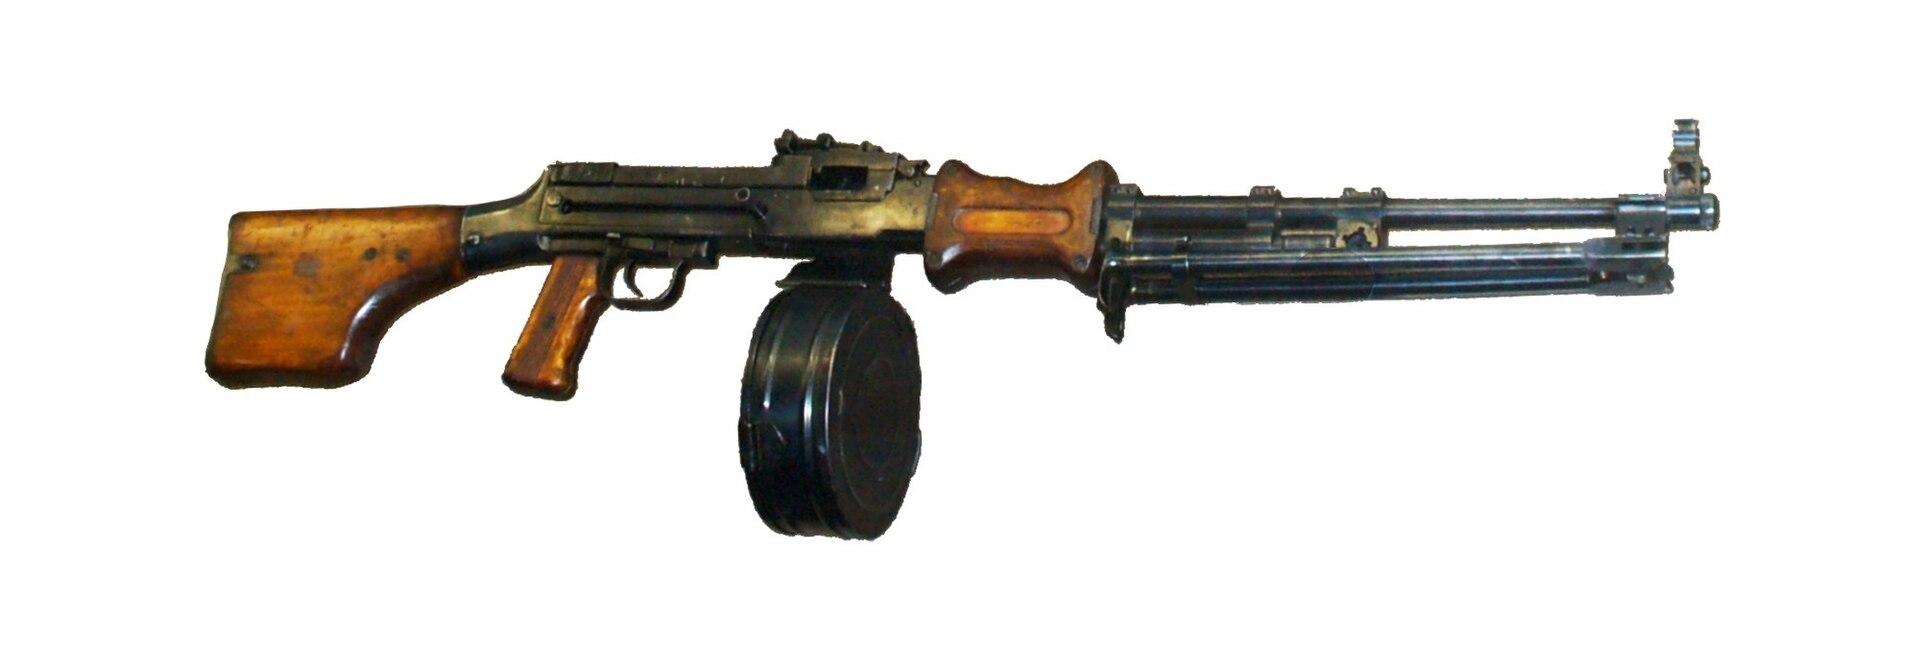 1920px-LMG-RPD-44.jpg